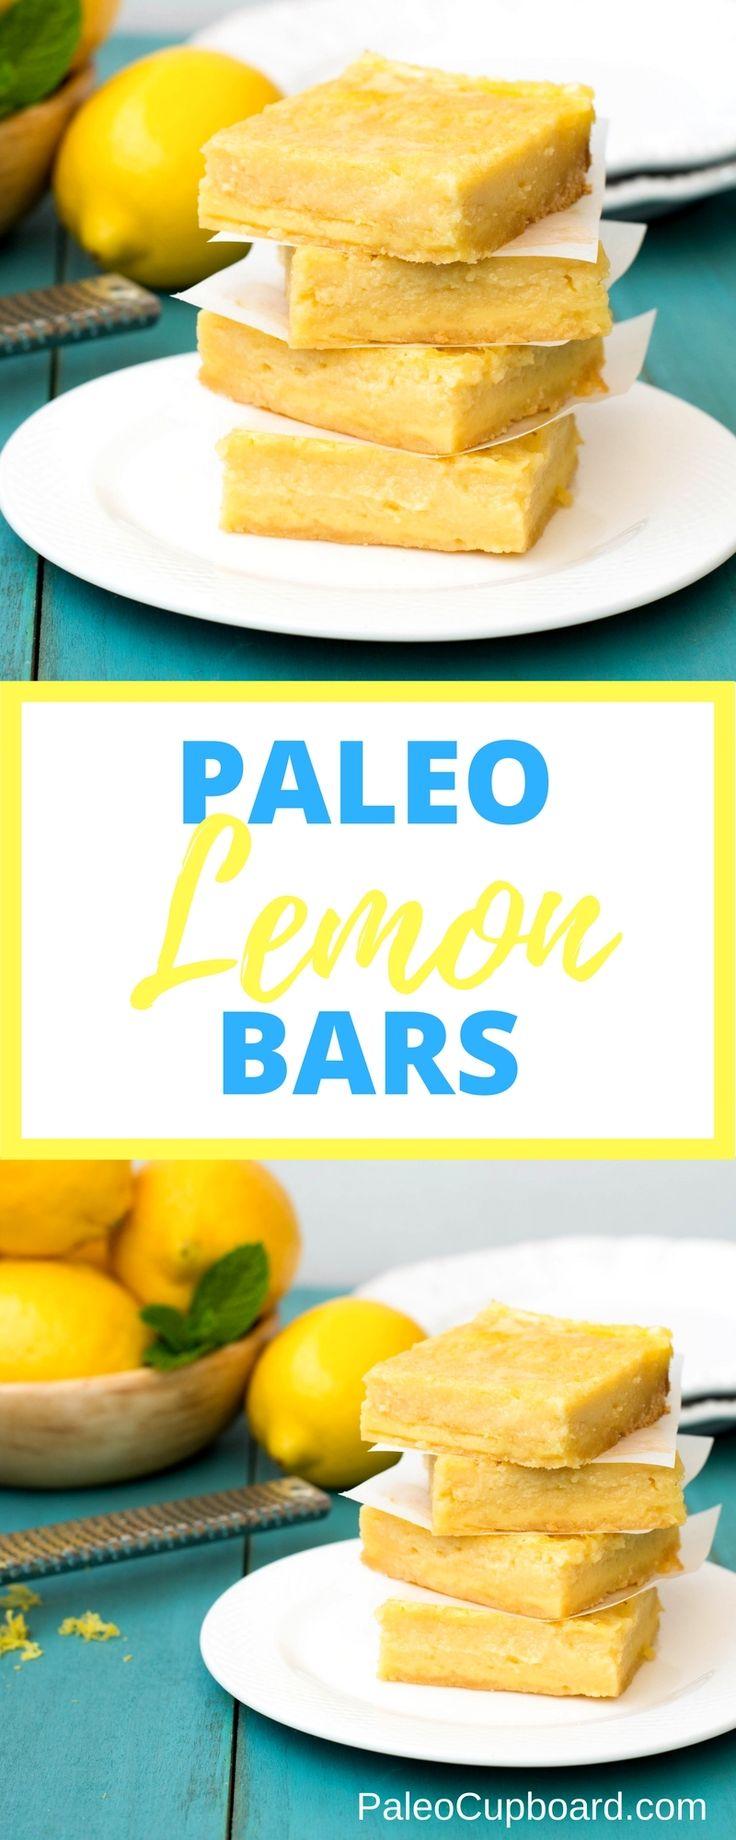 Paleo Lemon Bars - So tangy and tart, the perfect combination! www.PaleoCupboard.com